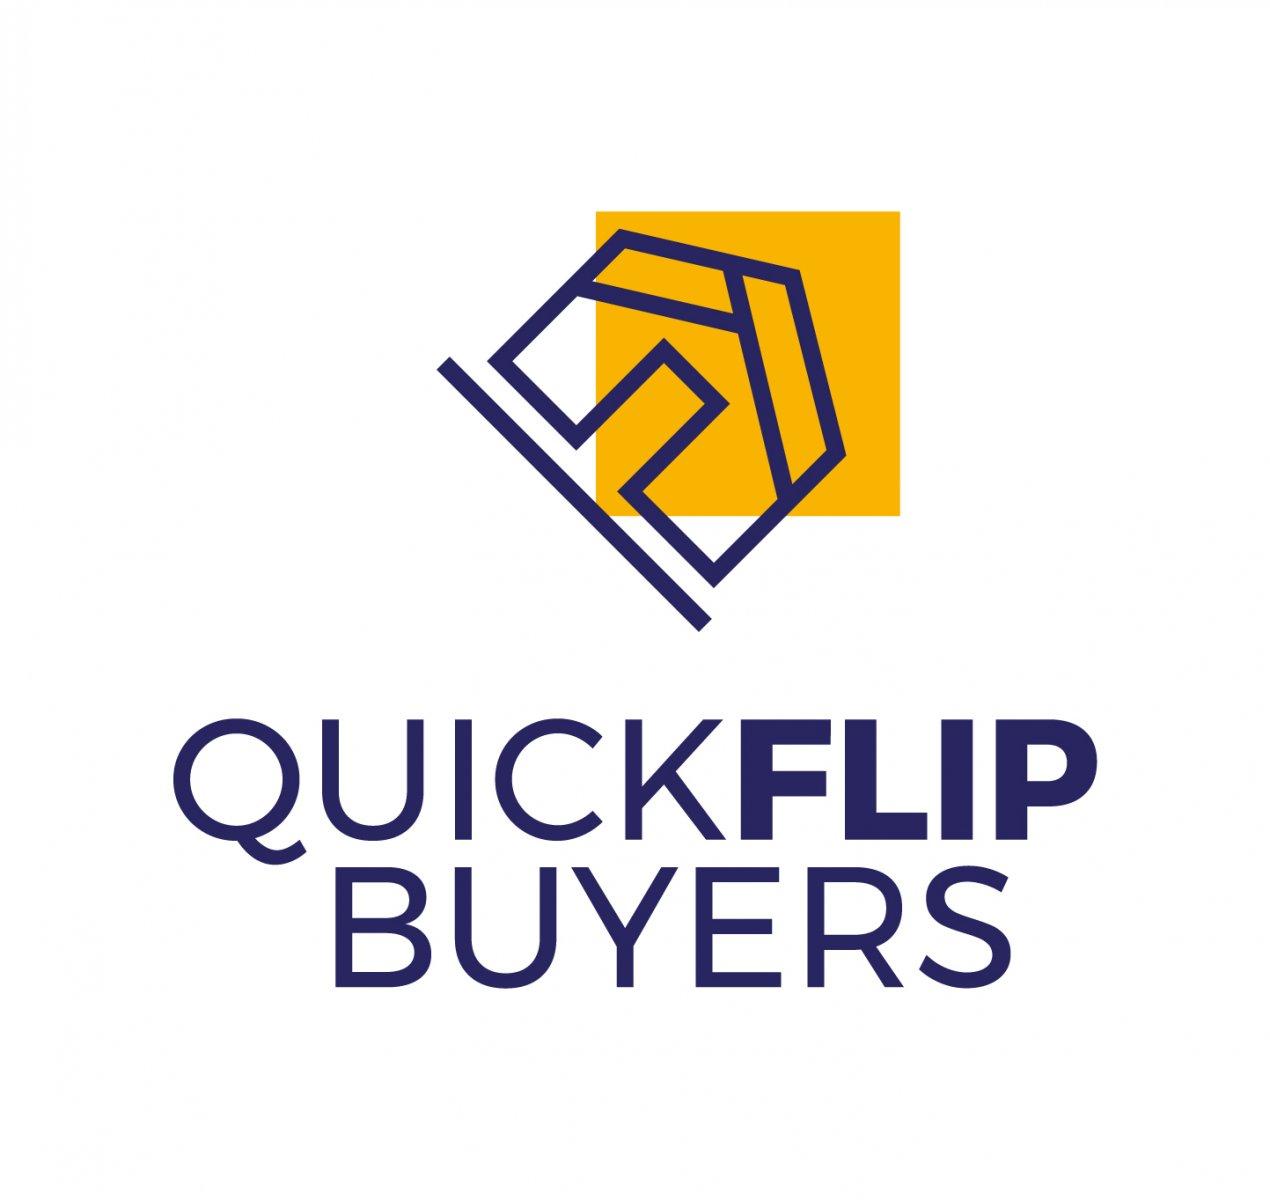 Quick Flip Buyers logo